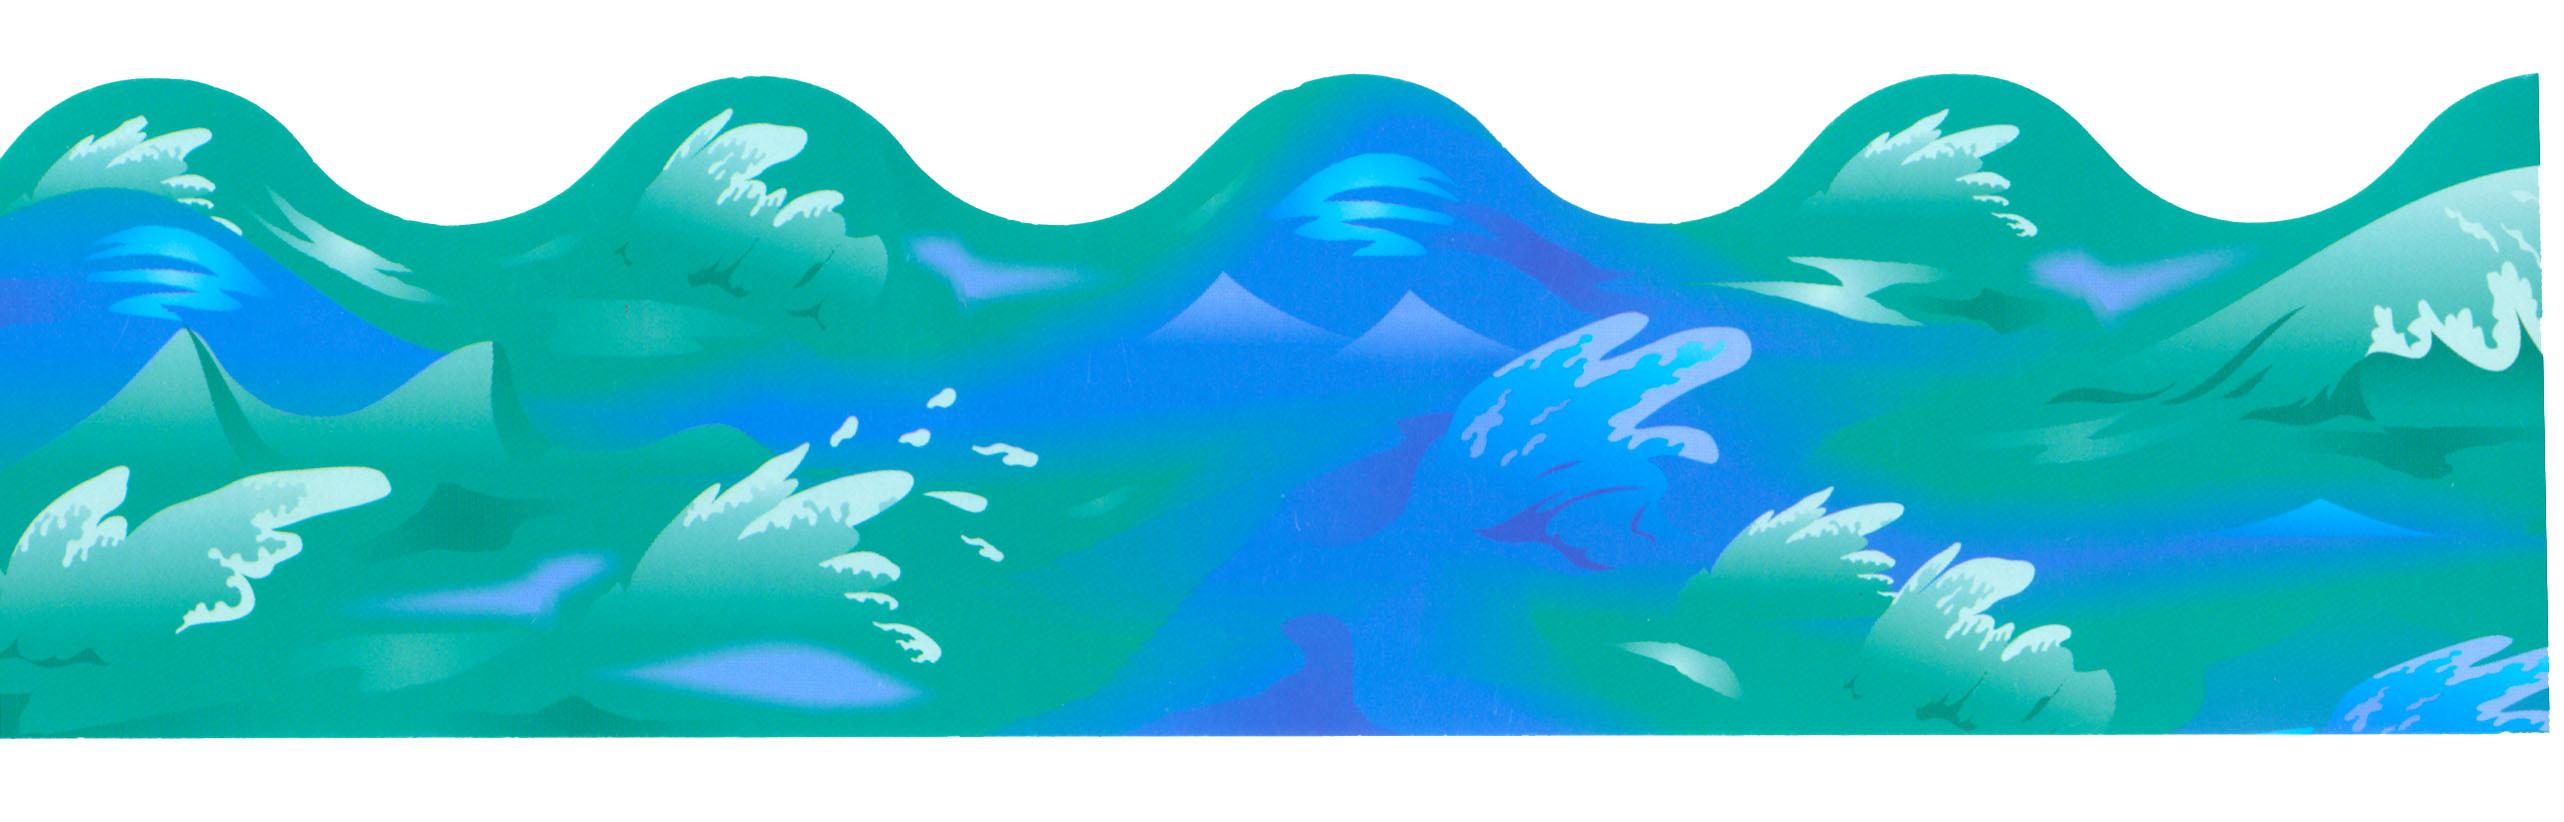 Ocean Clipart-ocean clipart-8